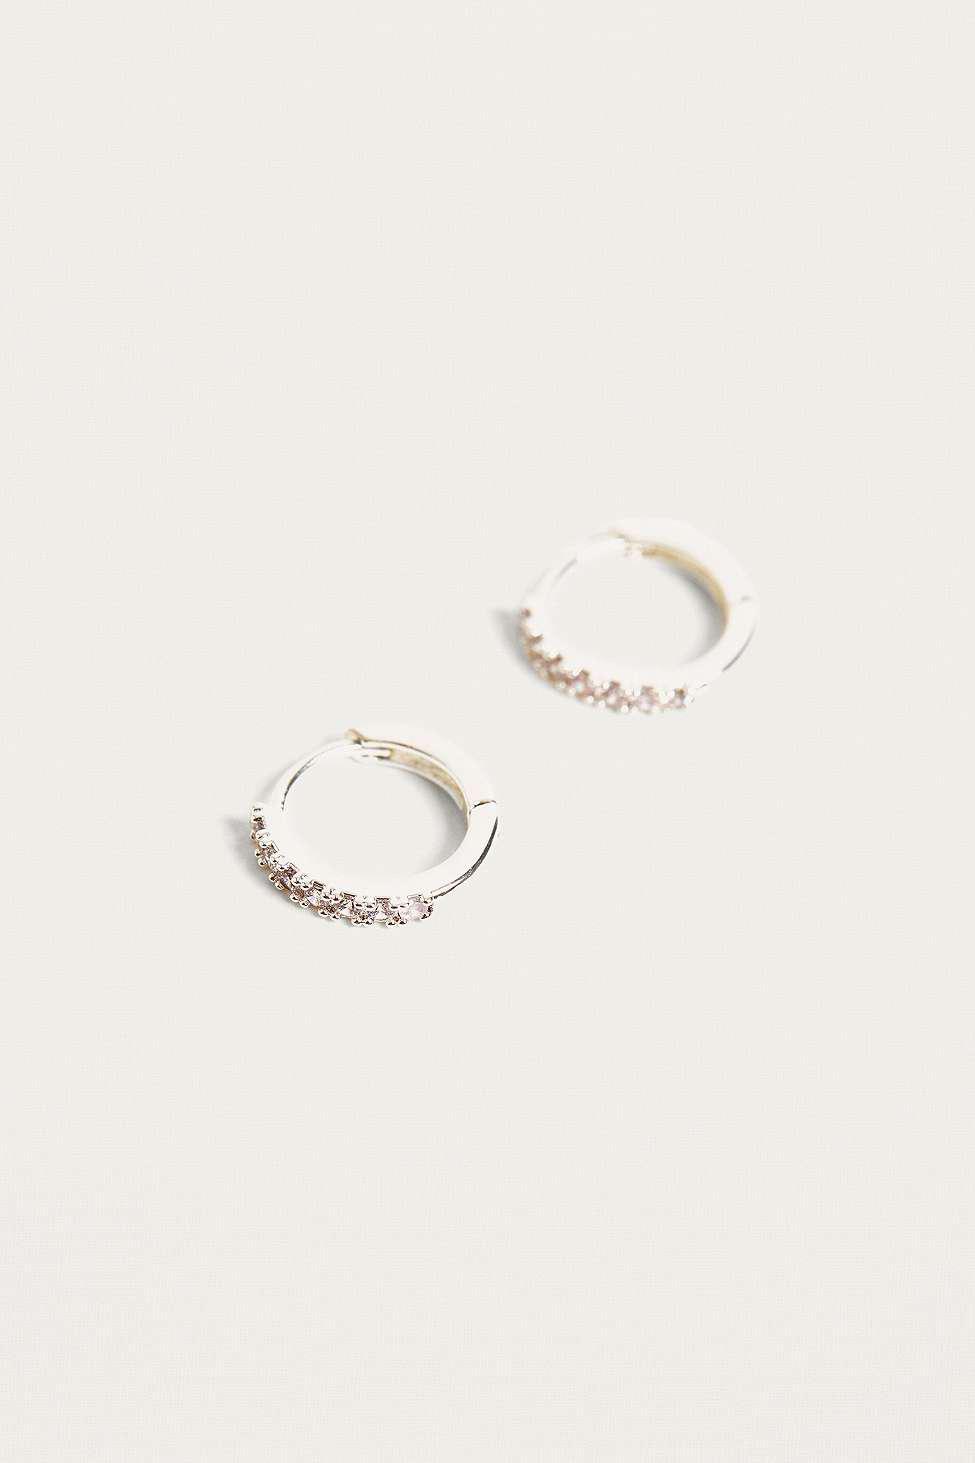 42c177fd7c Estella Bartlett Silver Plated Pave Hoop Earrings - Womens All in ...